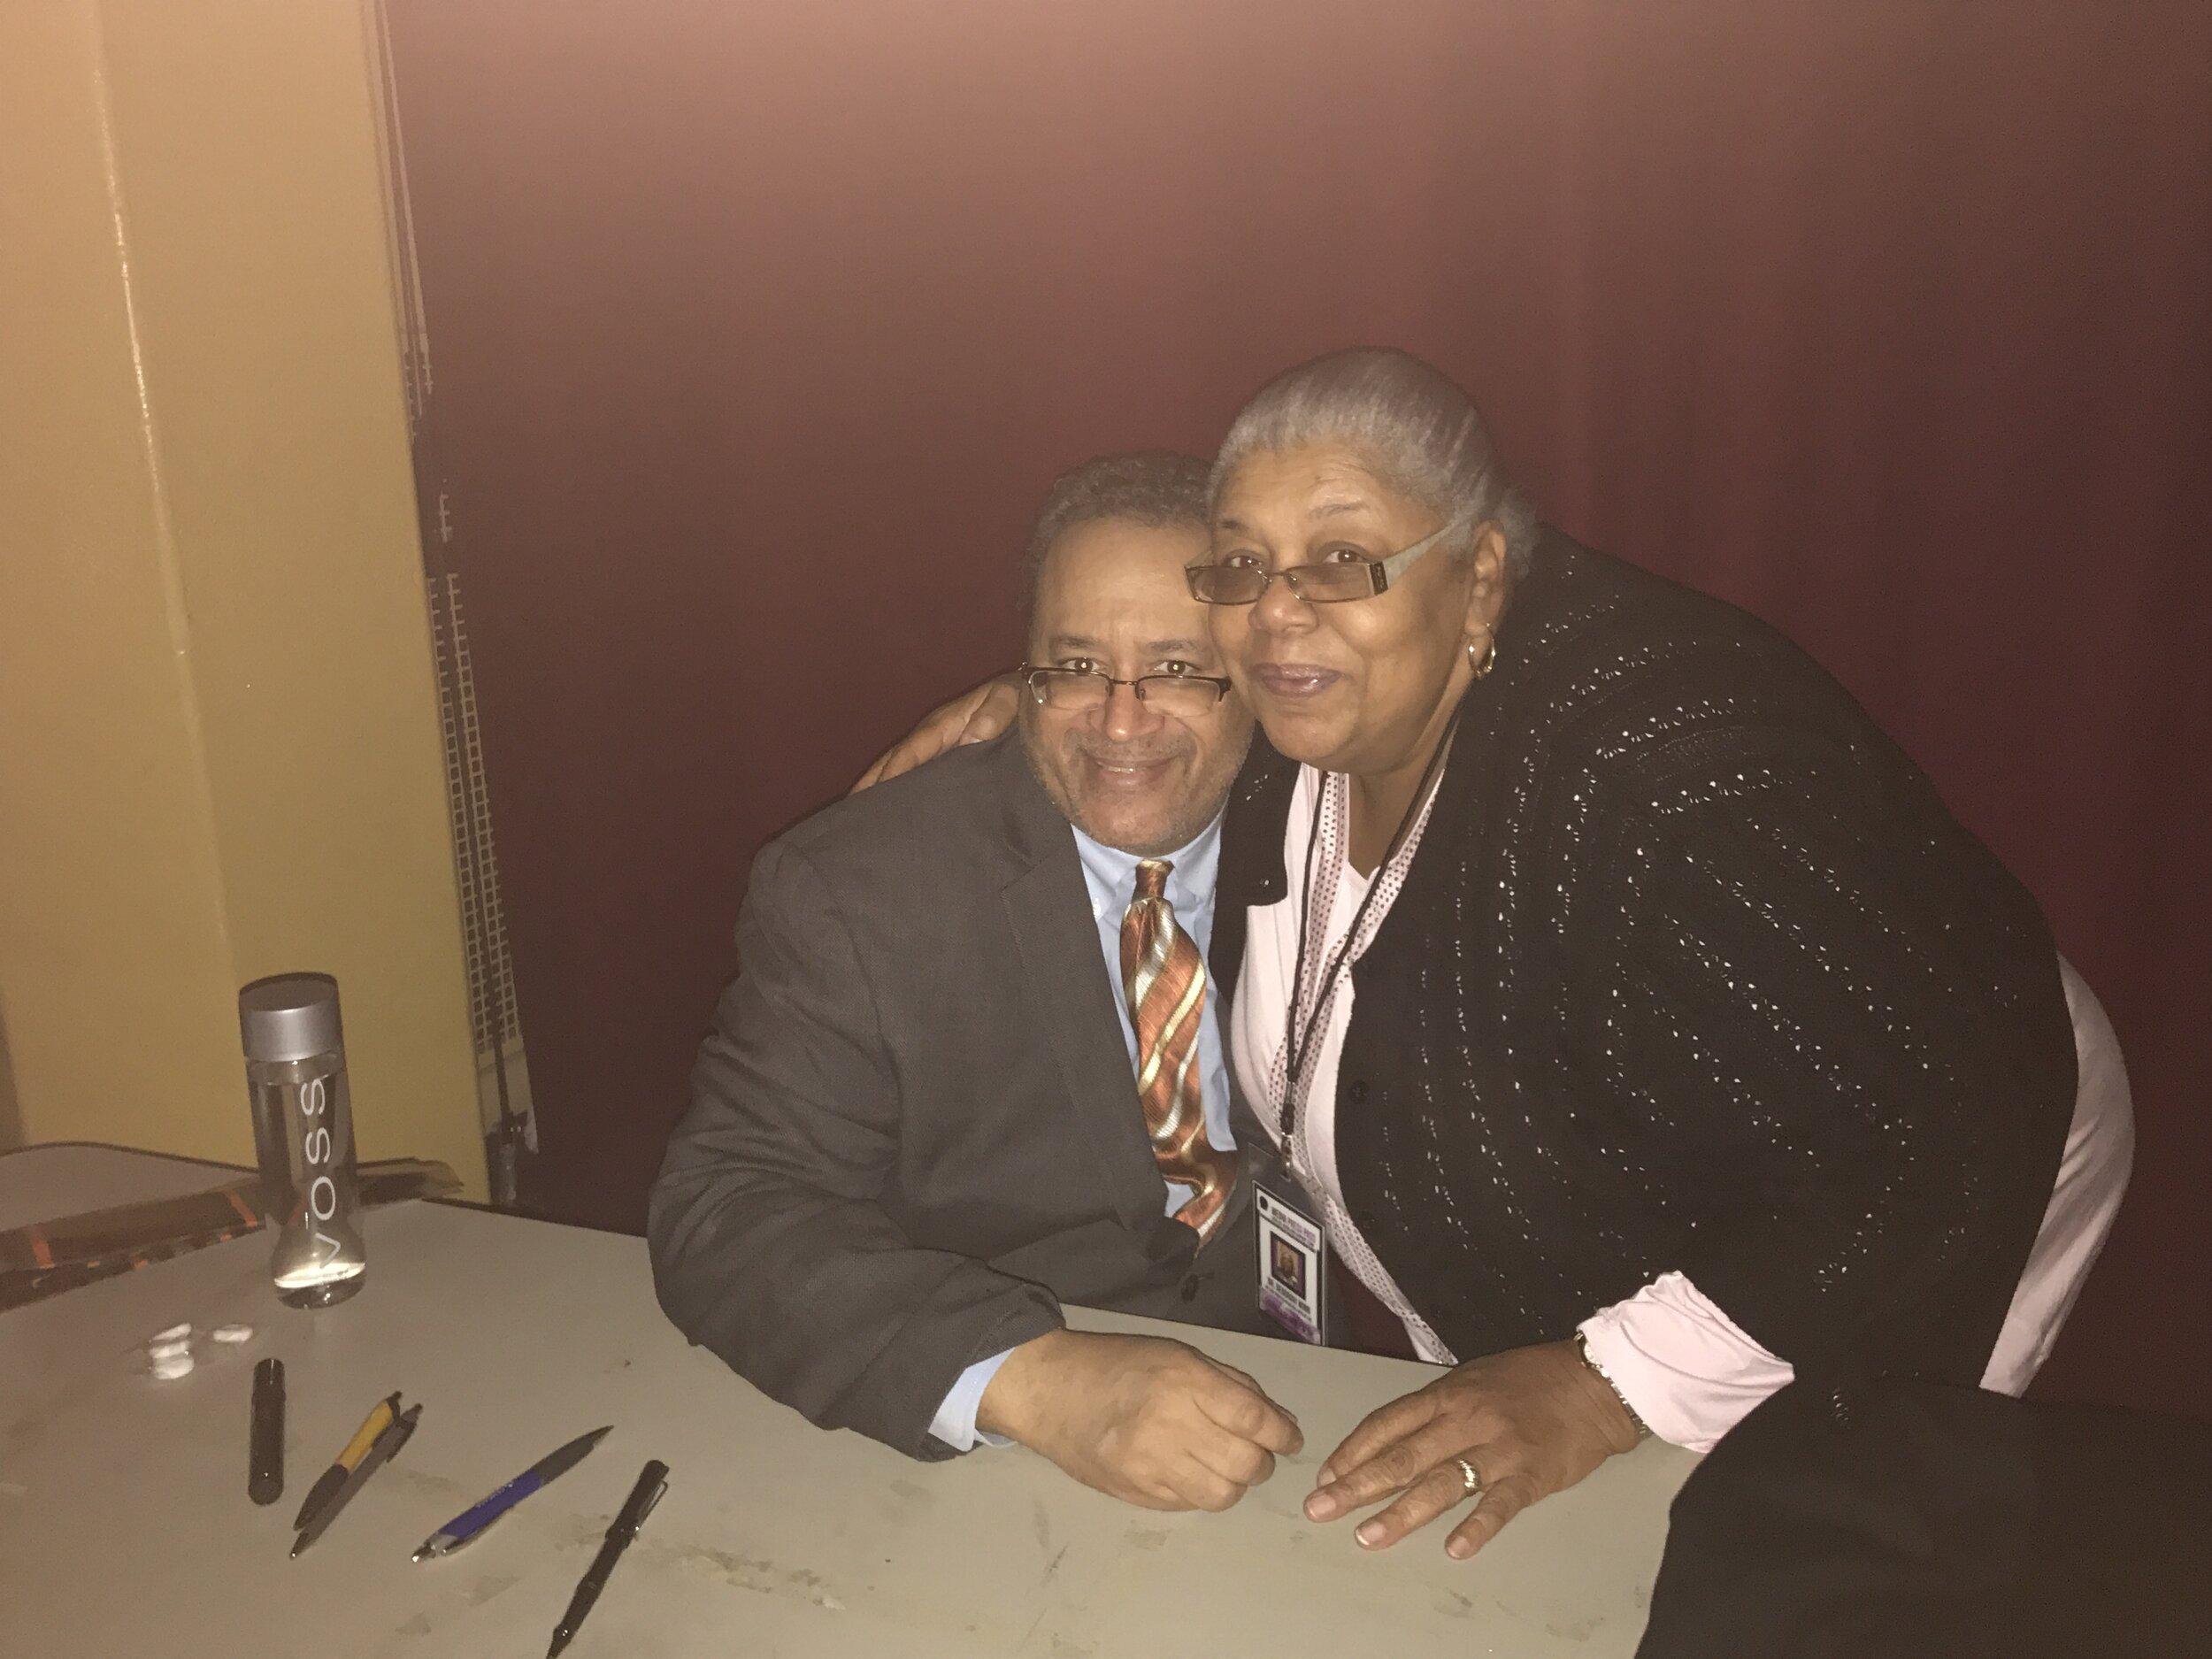 Dr. Deborah Winn and author Michael Eric Dyson